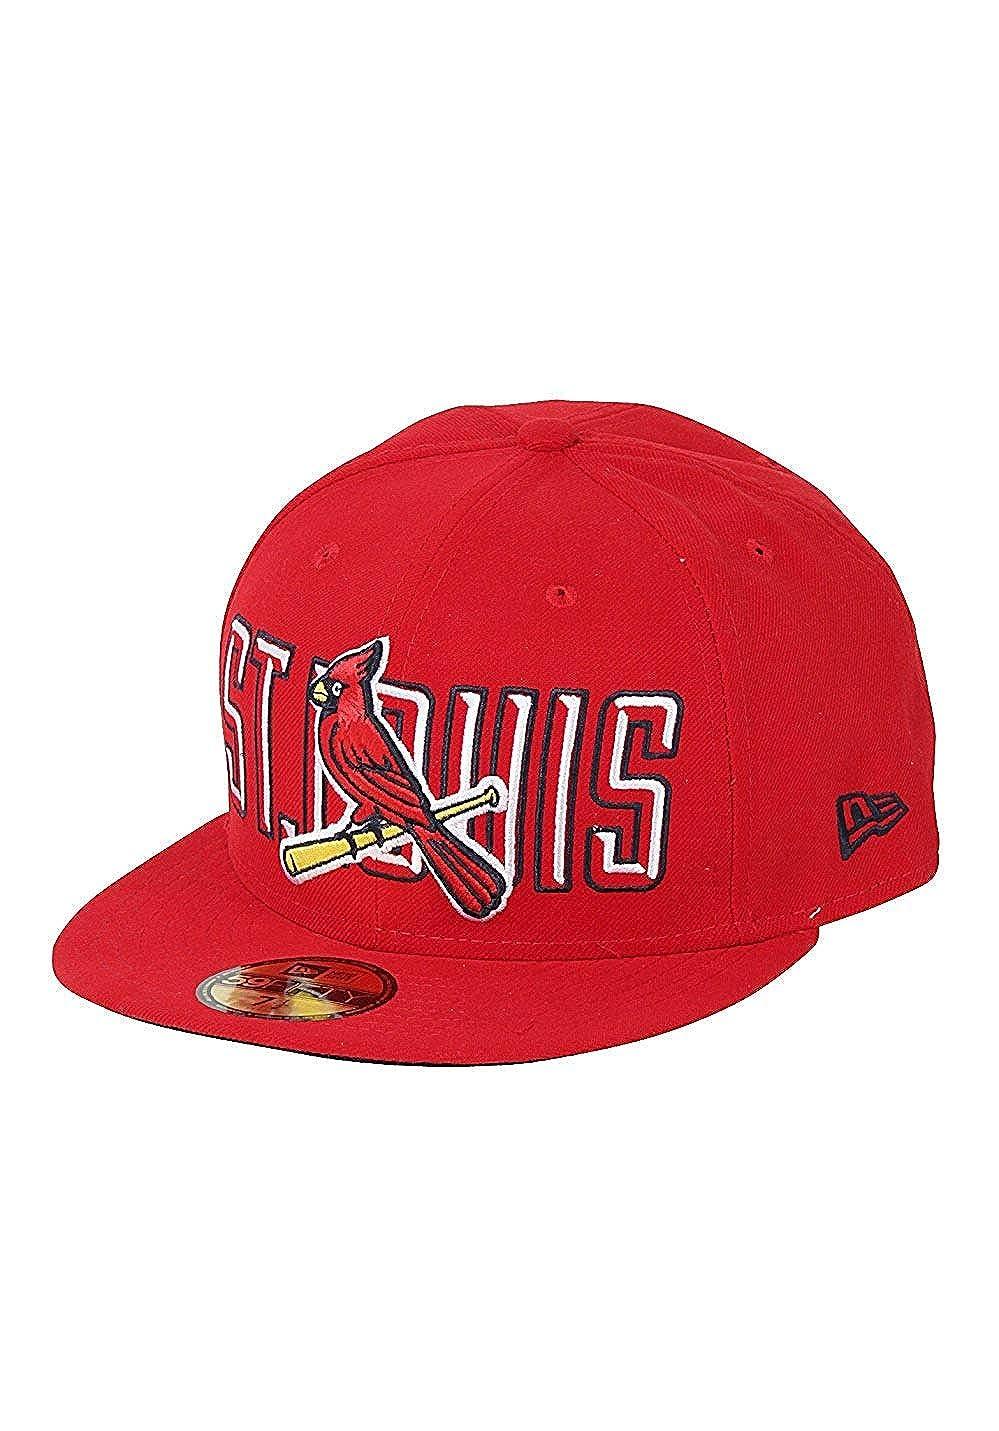 New Era Men Caps//Fitted Cap Bevel Pitch ST Louis Cardinals